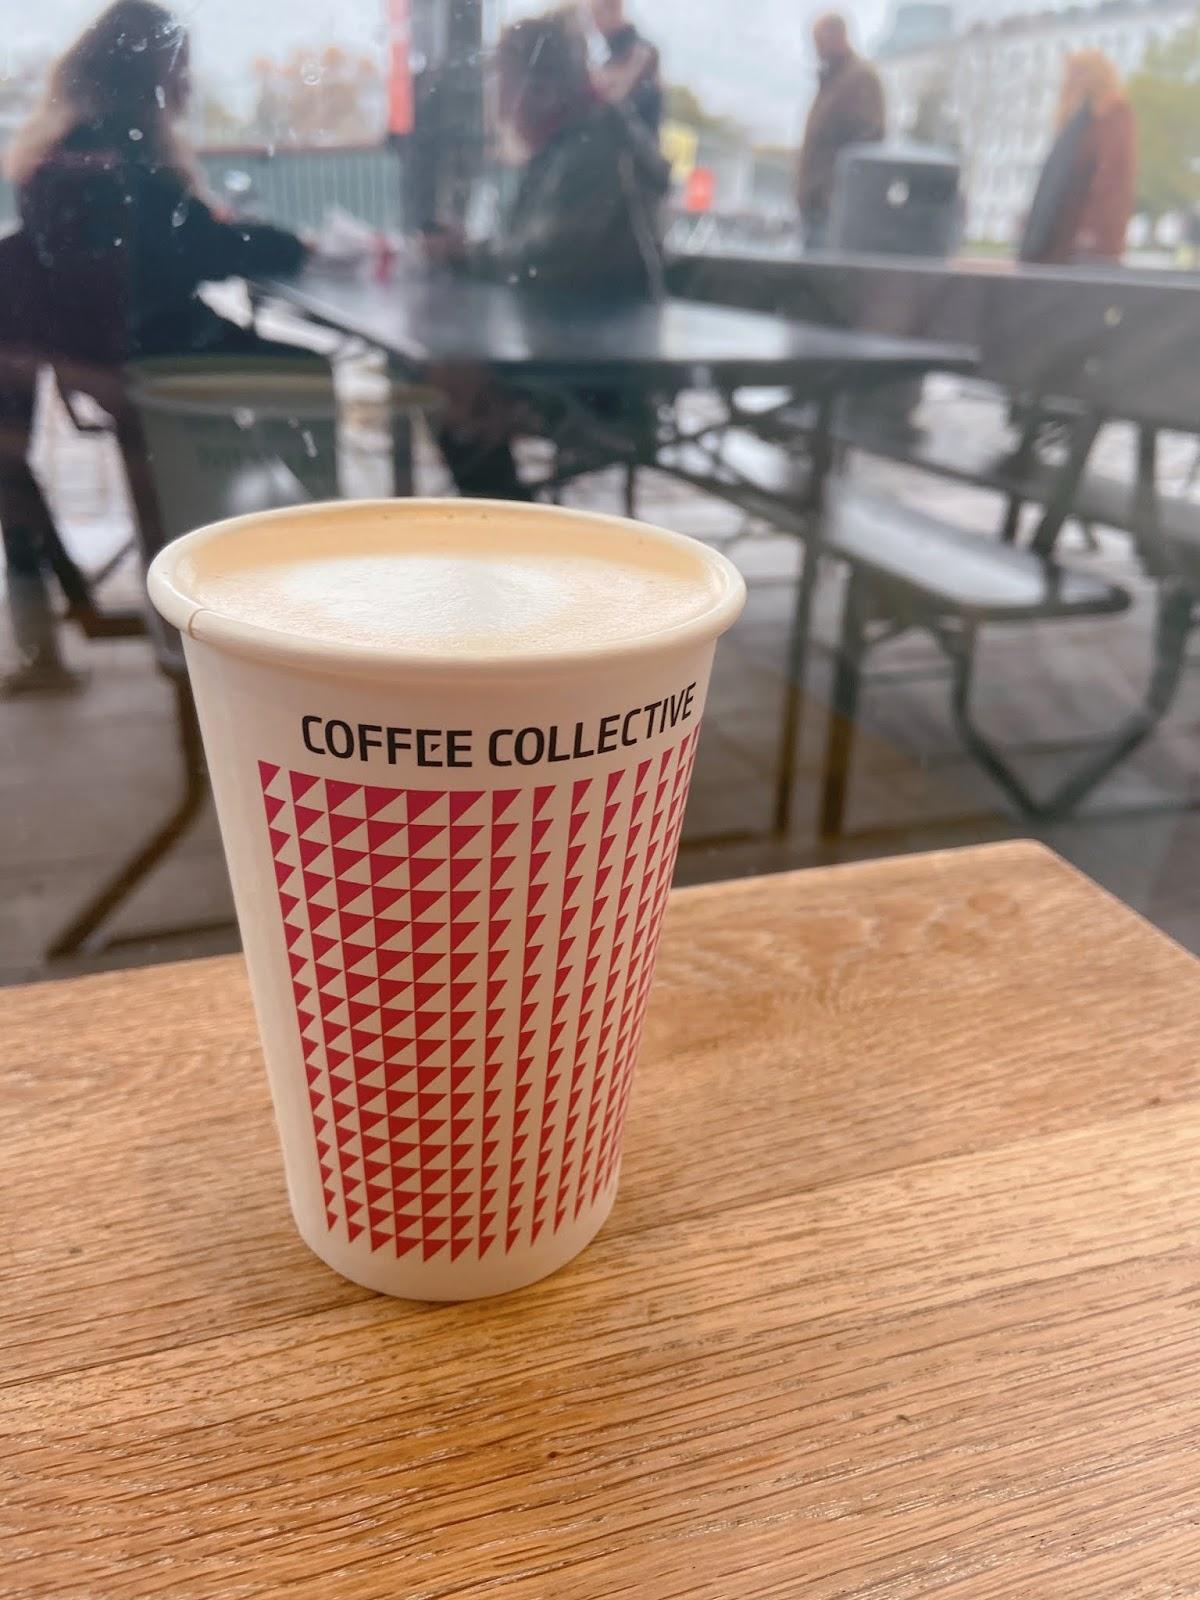 Coffee Collective Torvehallerne Copenhagen